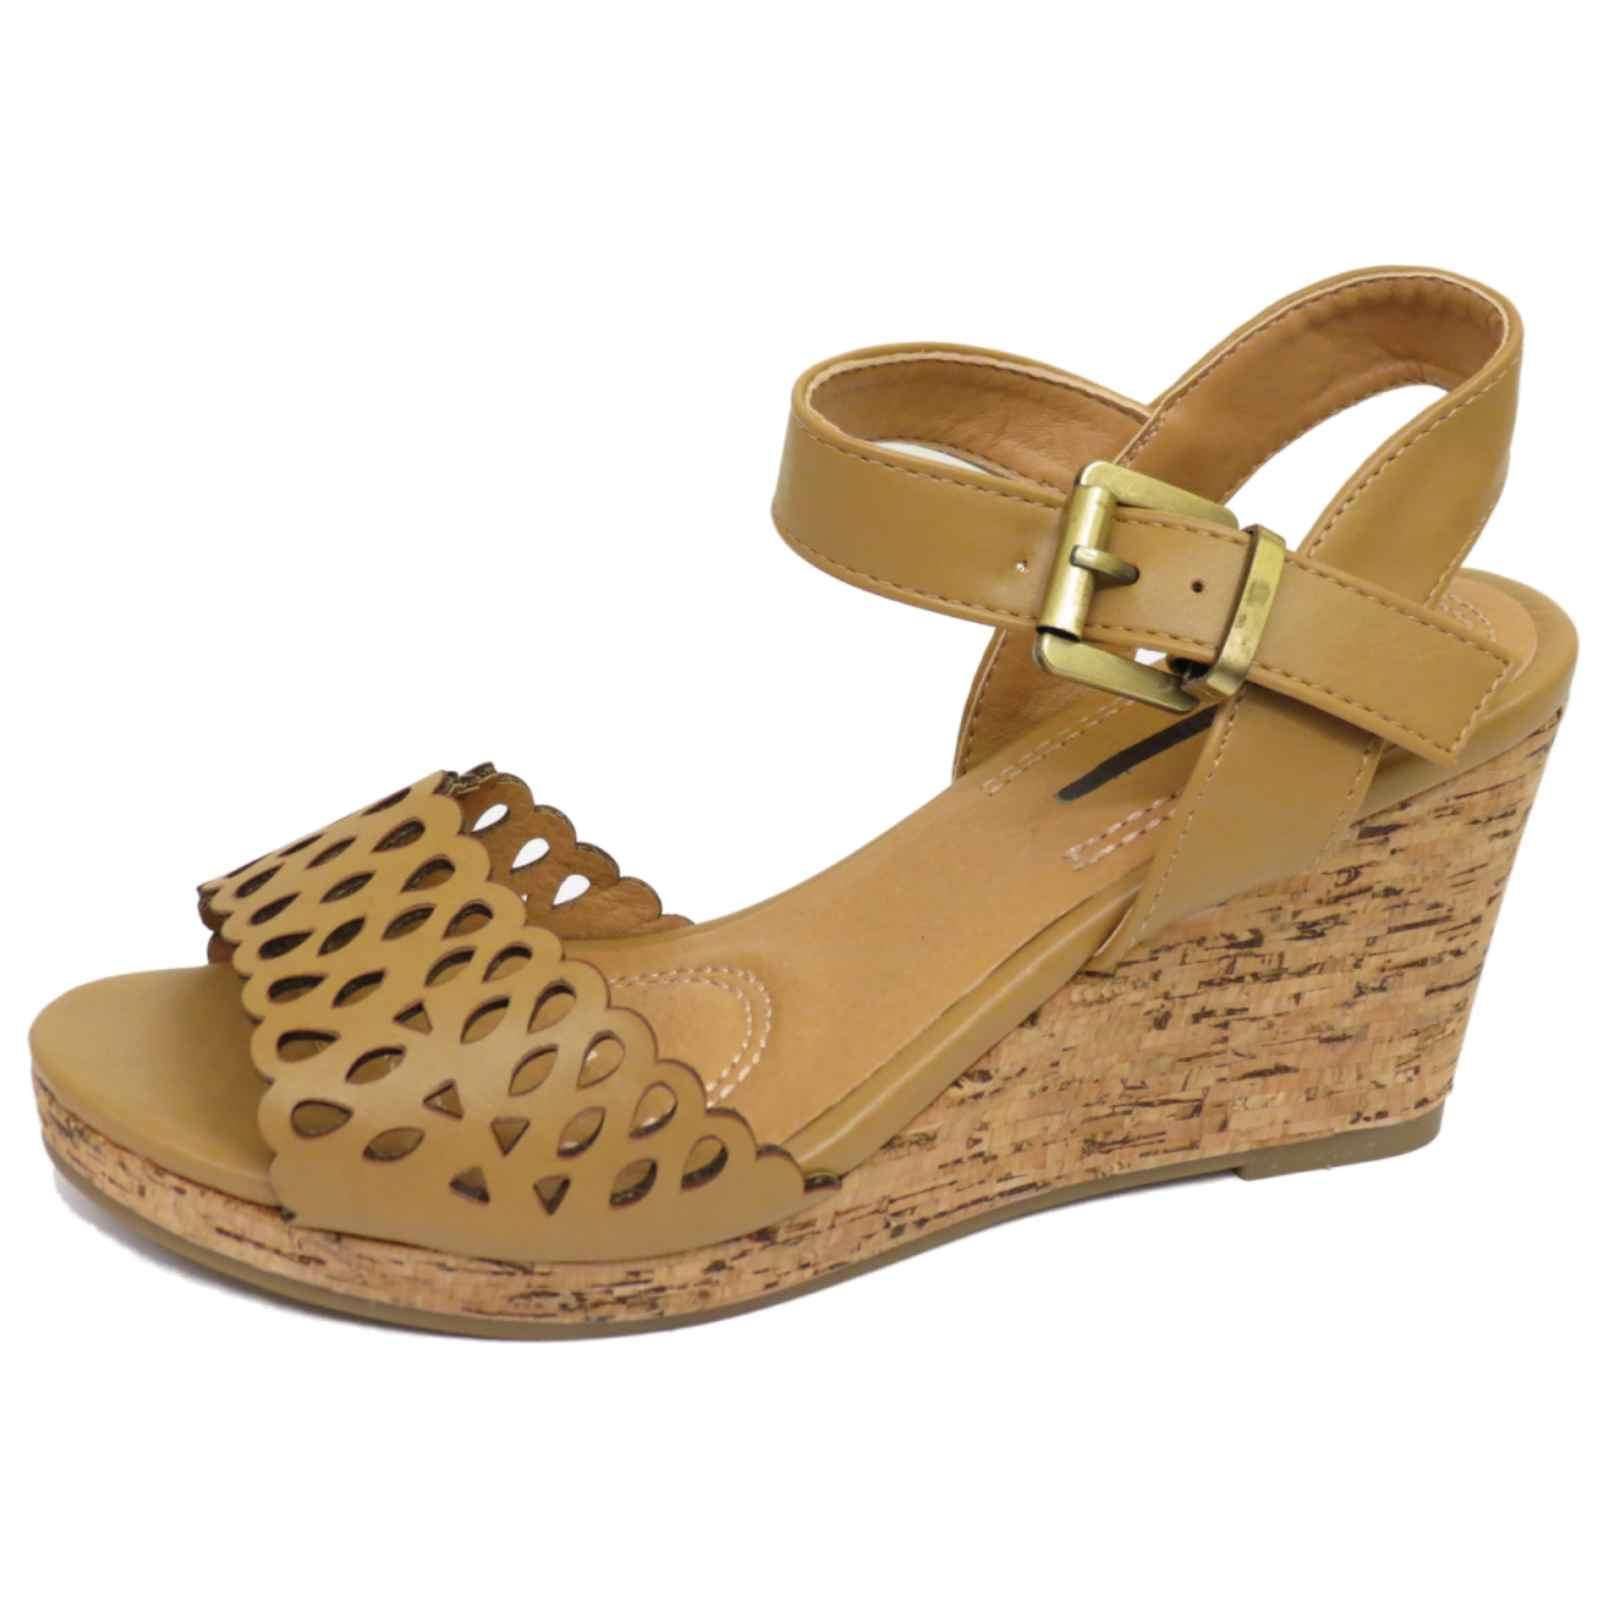 wedge platform summer sandals peep toe ankle